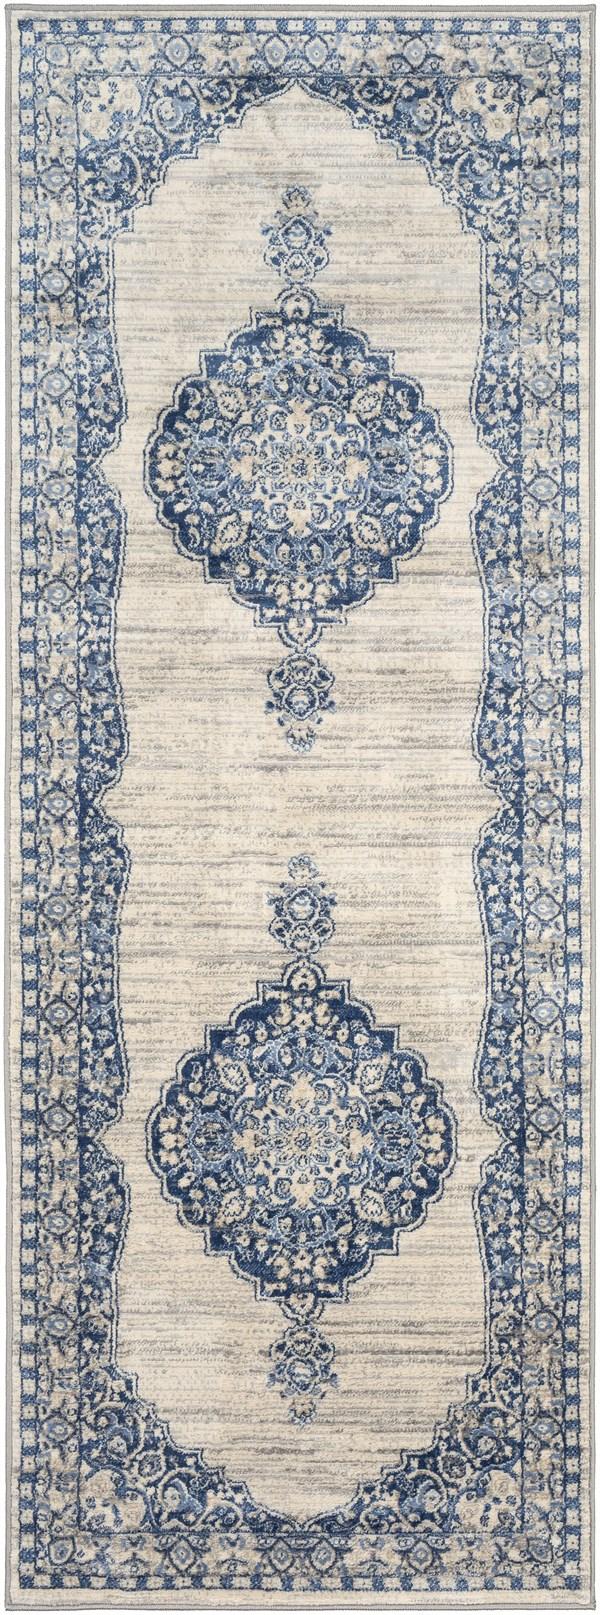 Blue, Cream, Grey Vintage / Overdyed Area Rug